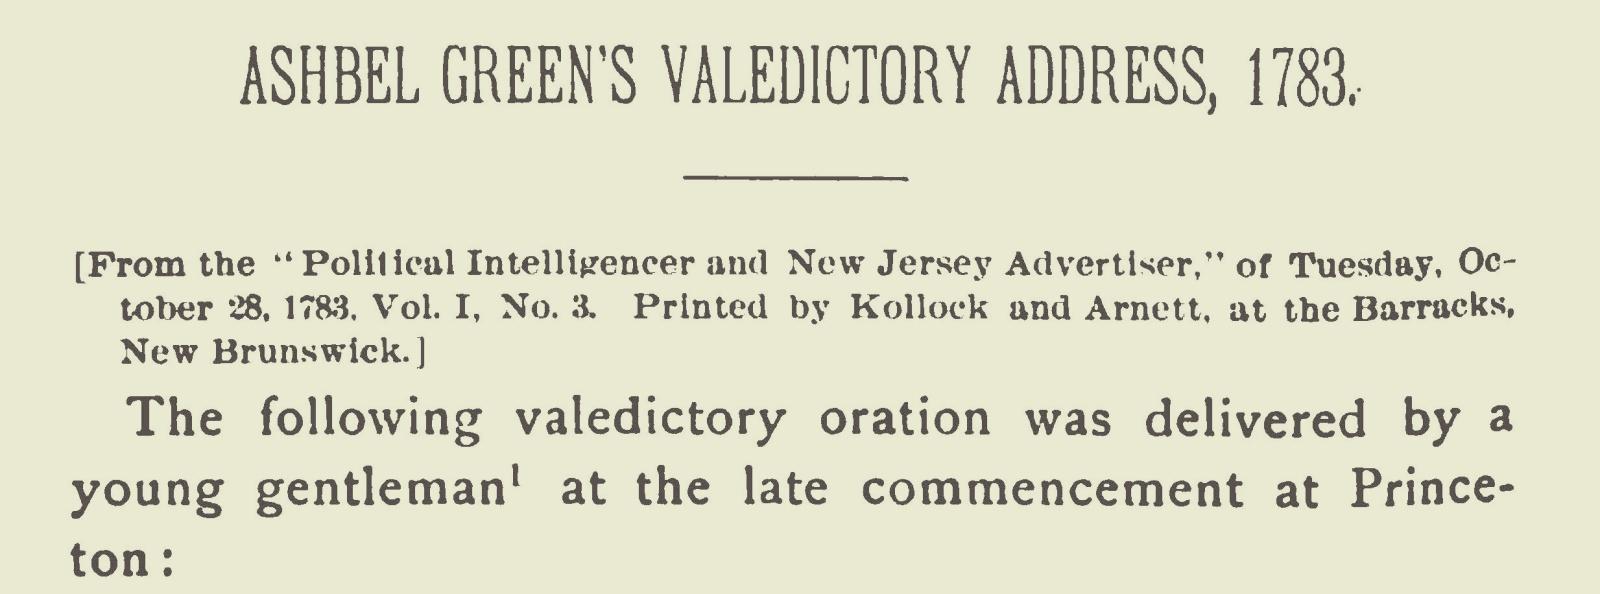 Green, Ashbel, Valedictory Address Title Page.jpg